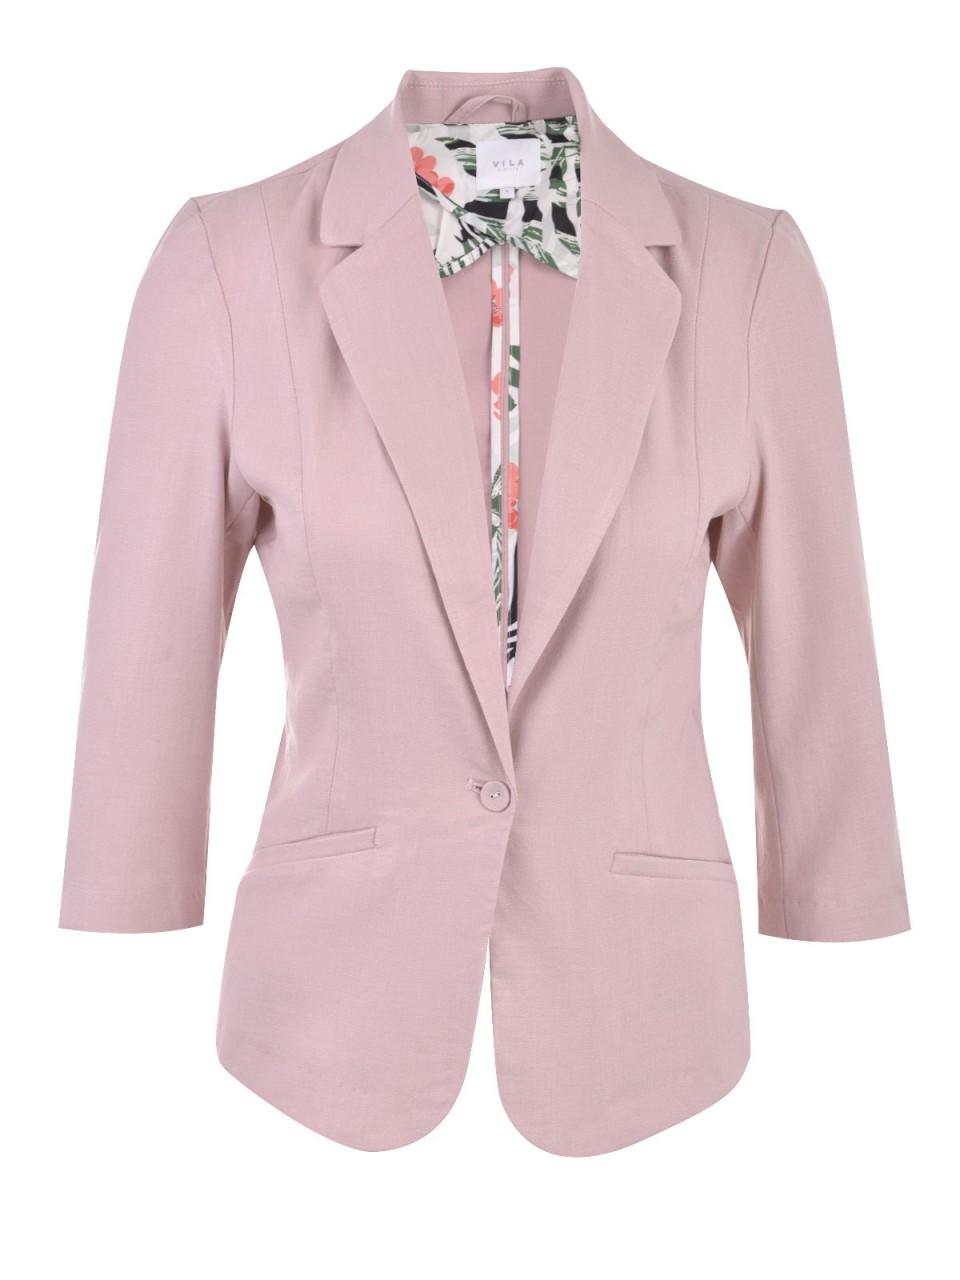 vila-damen-blazer-rosa